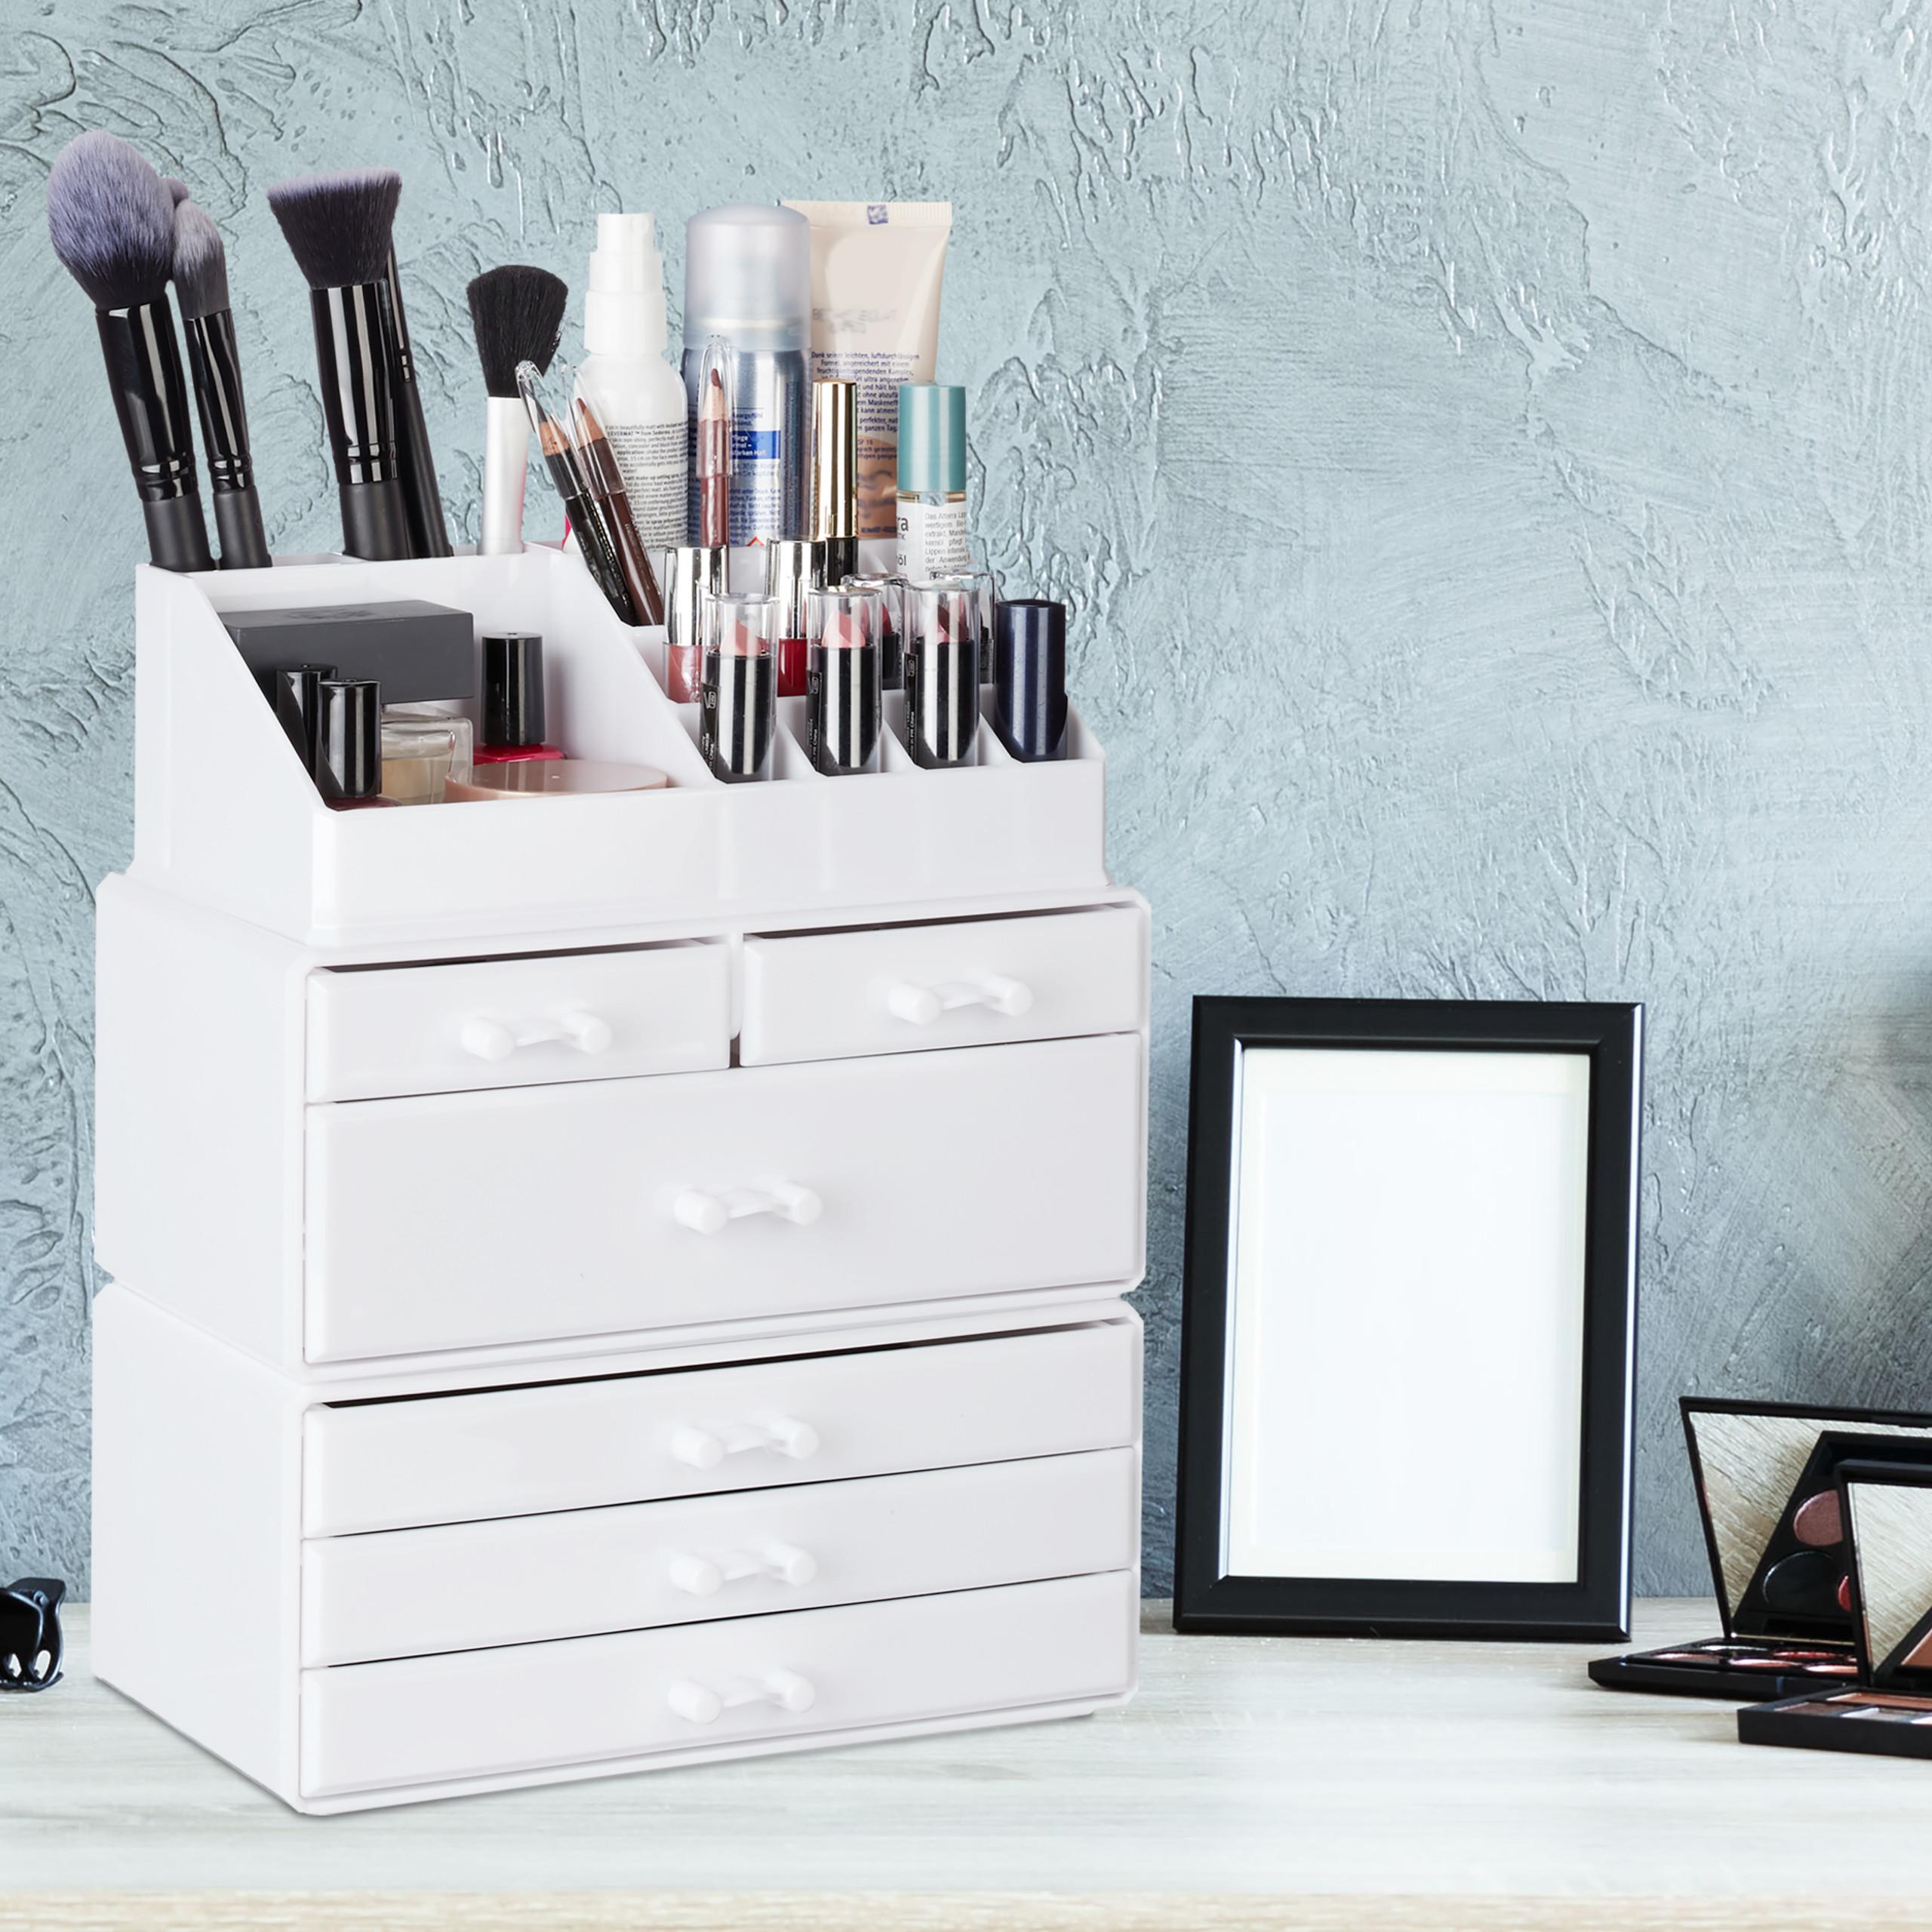 make-up-organizer-met-6-lades-acryl-cosmeticahouder-make-up-cosmetica-opslag miniatuur 19